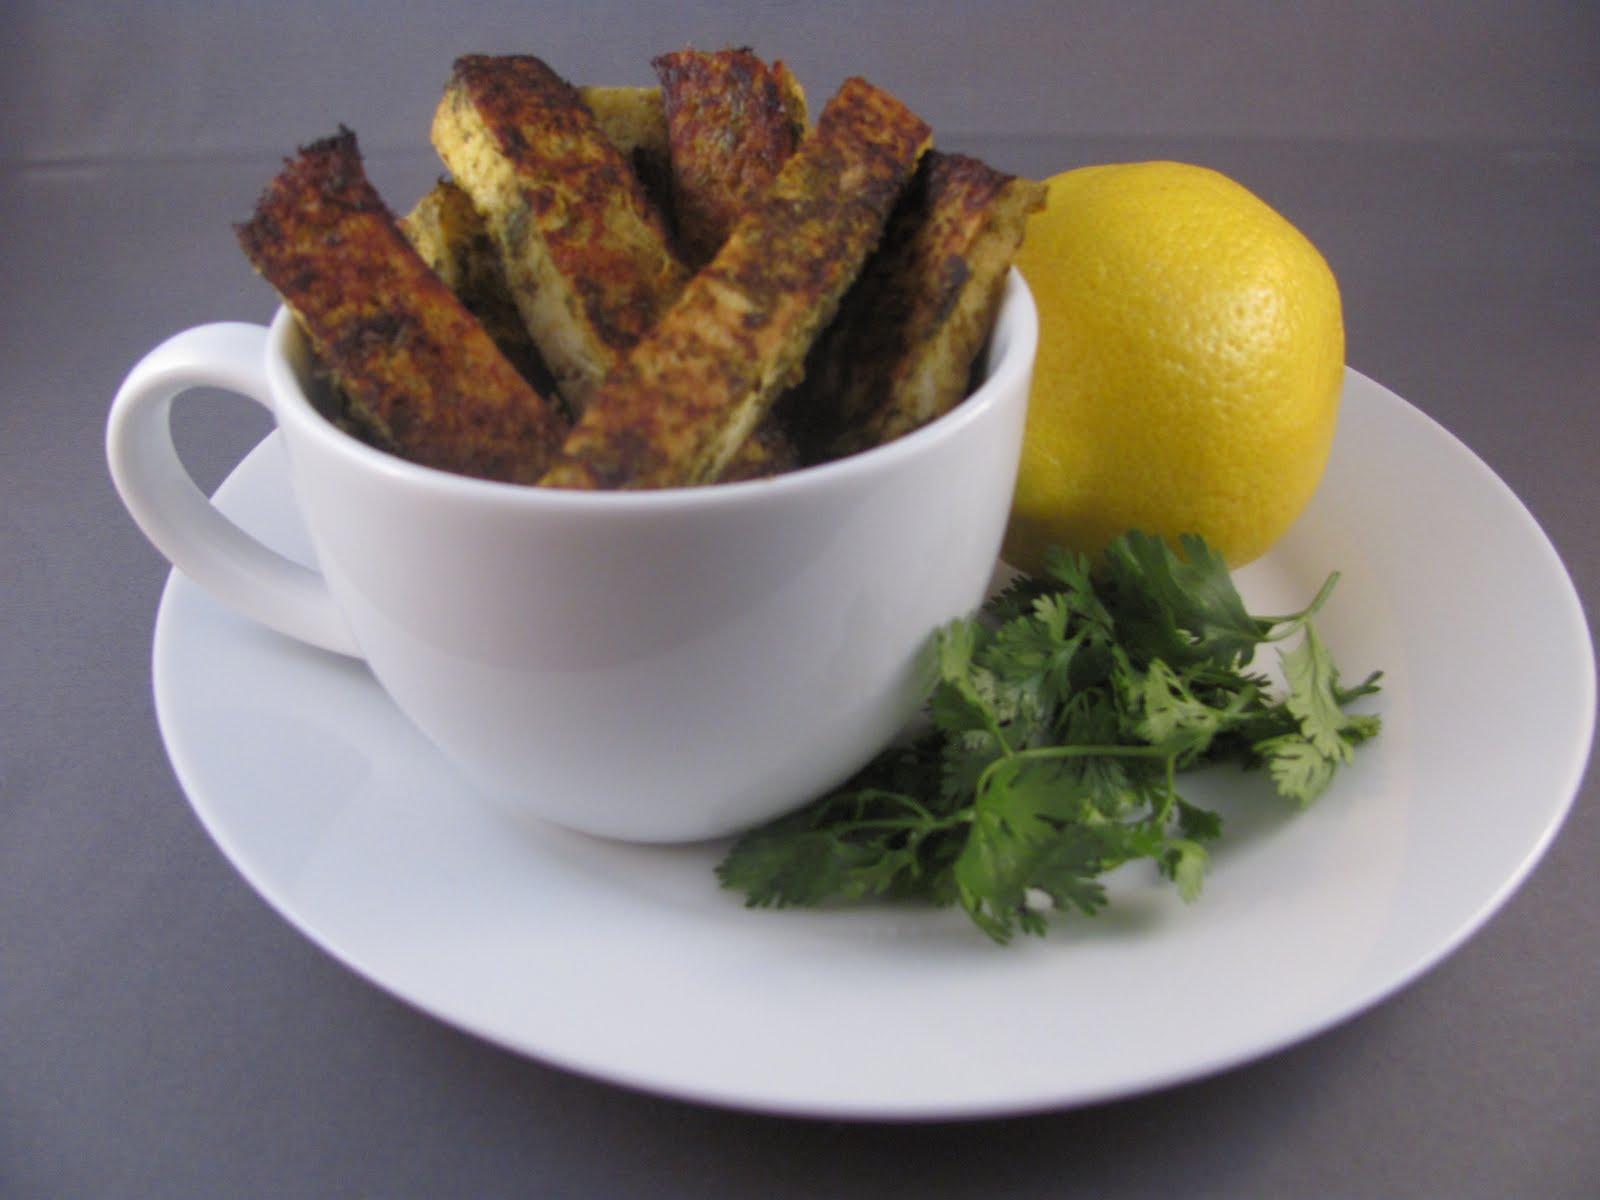 Veggie by Season: Spicy Cilantro Baked Lemon Tofu Sticks